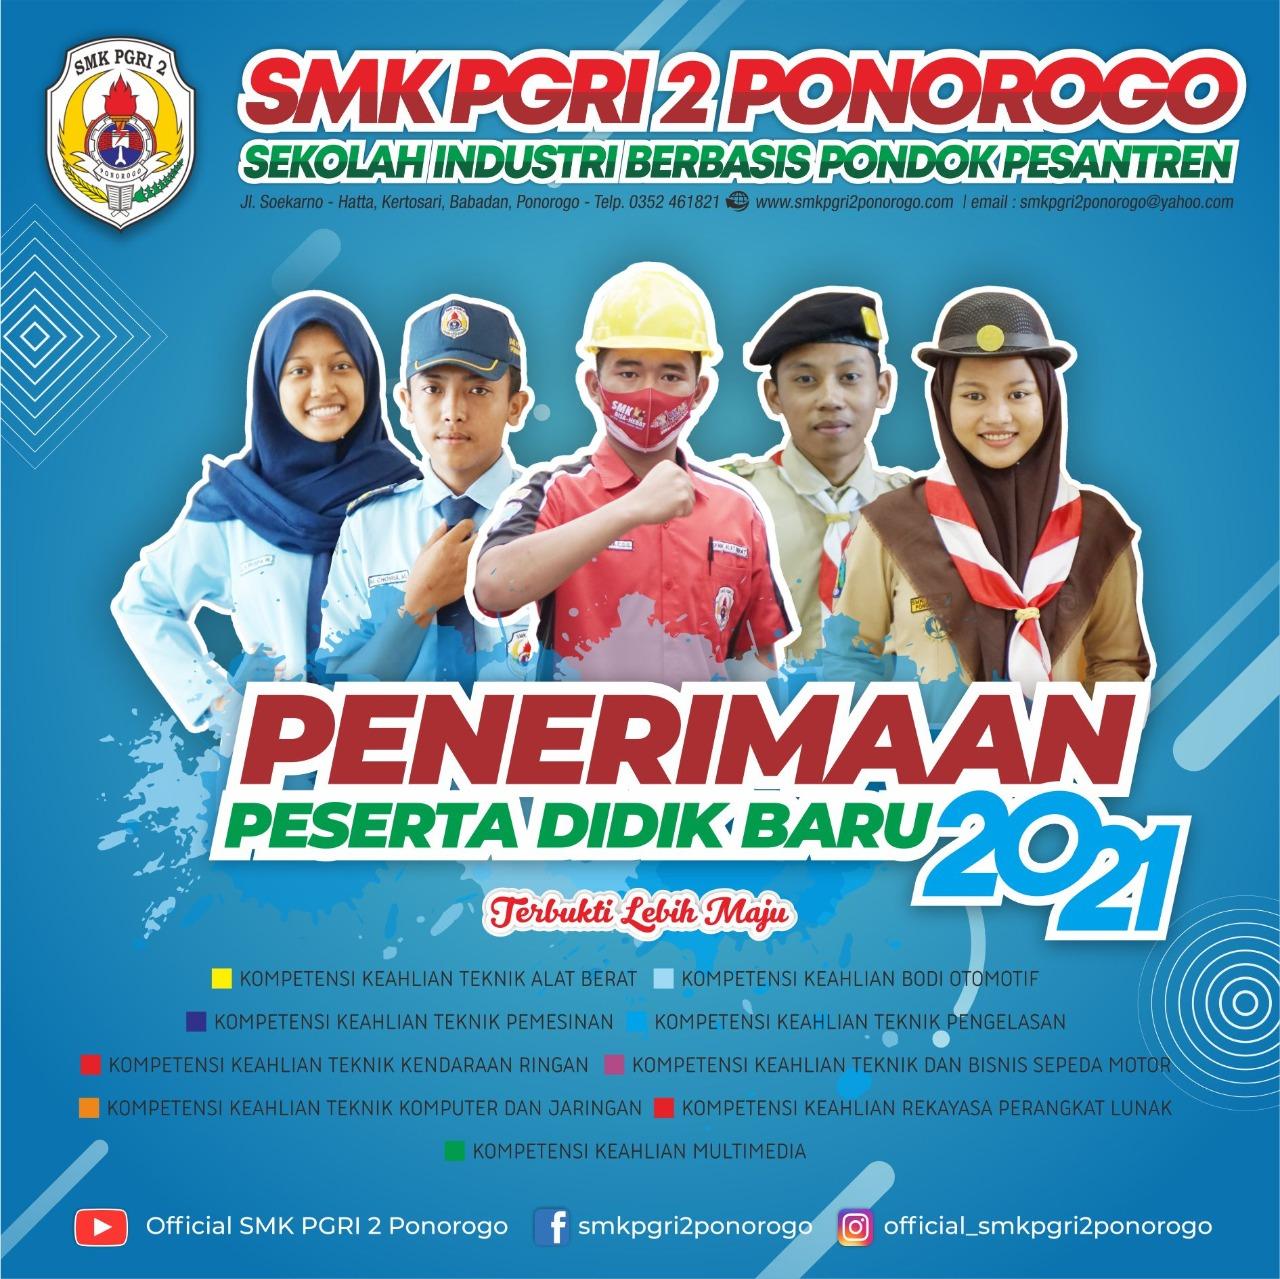 PPDB SMK PGRI 2 PONOROGO 2021